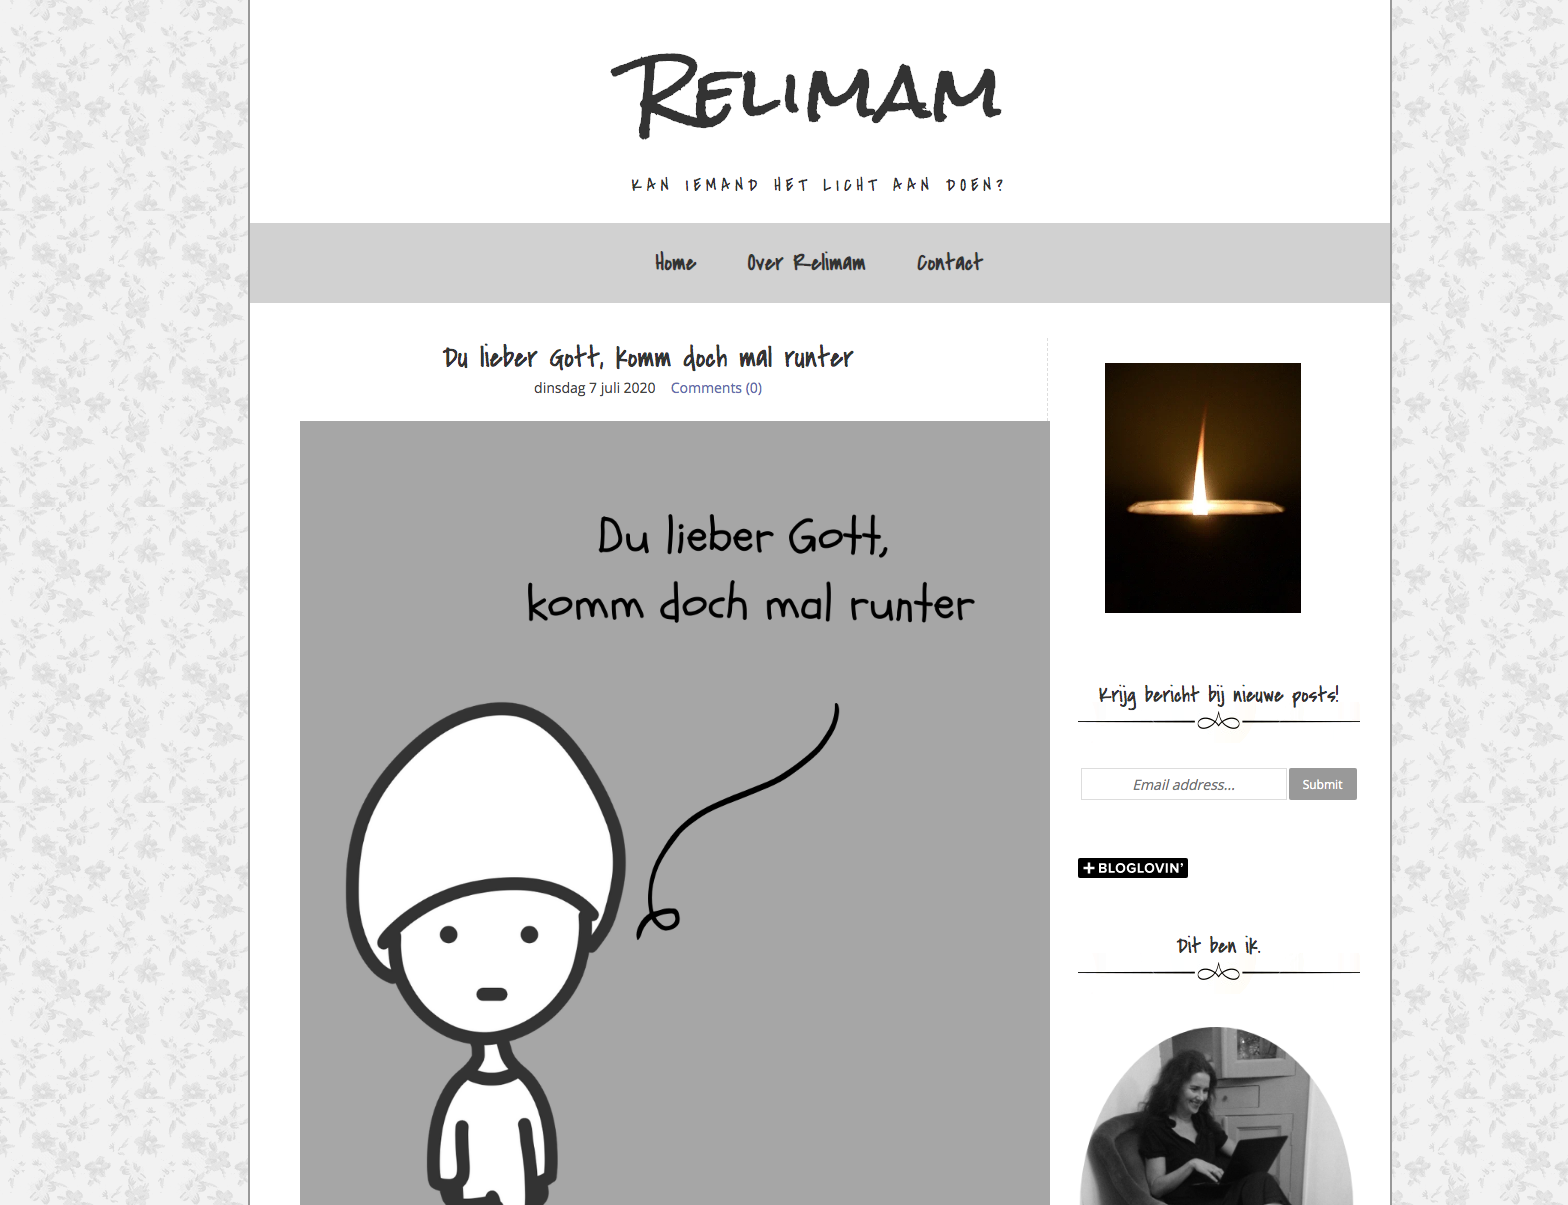 Relimam